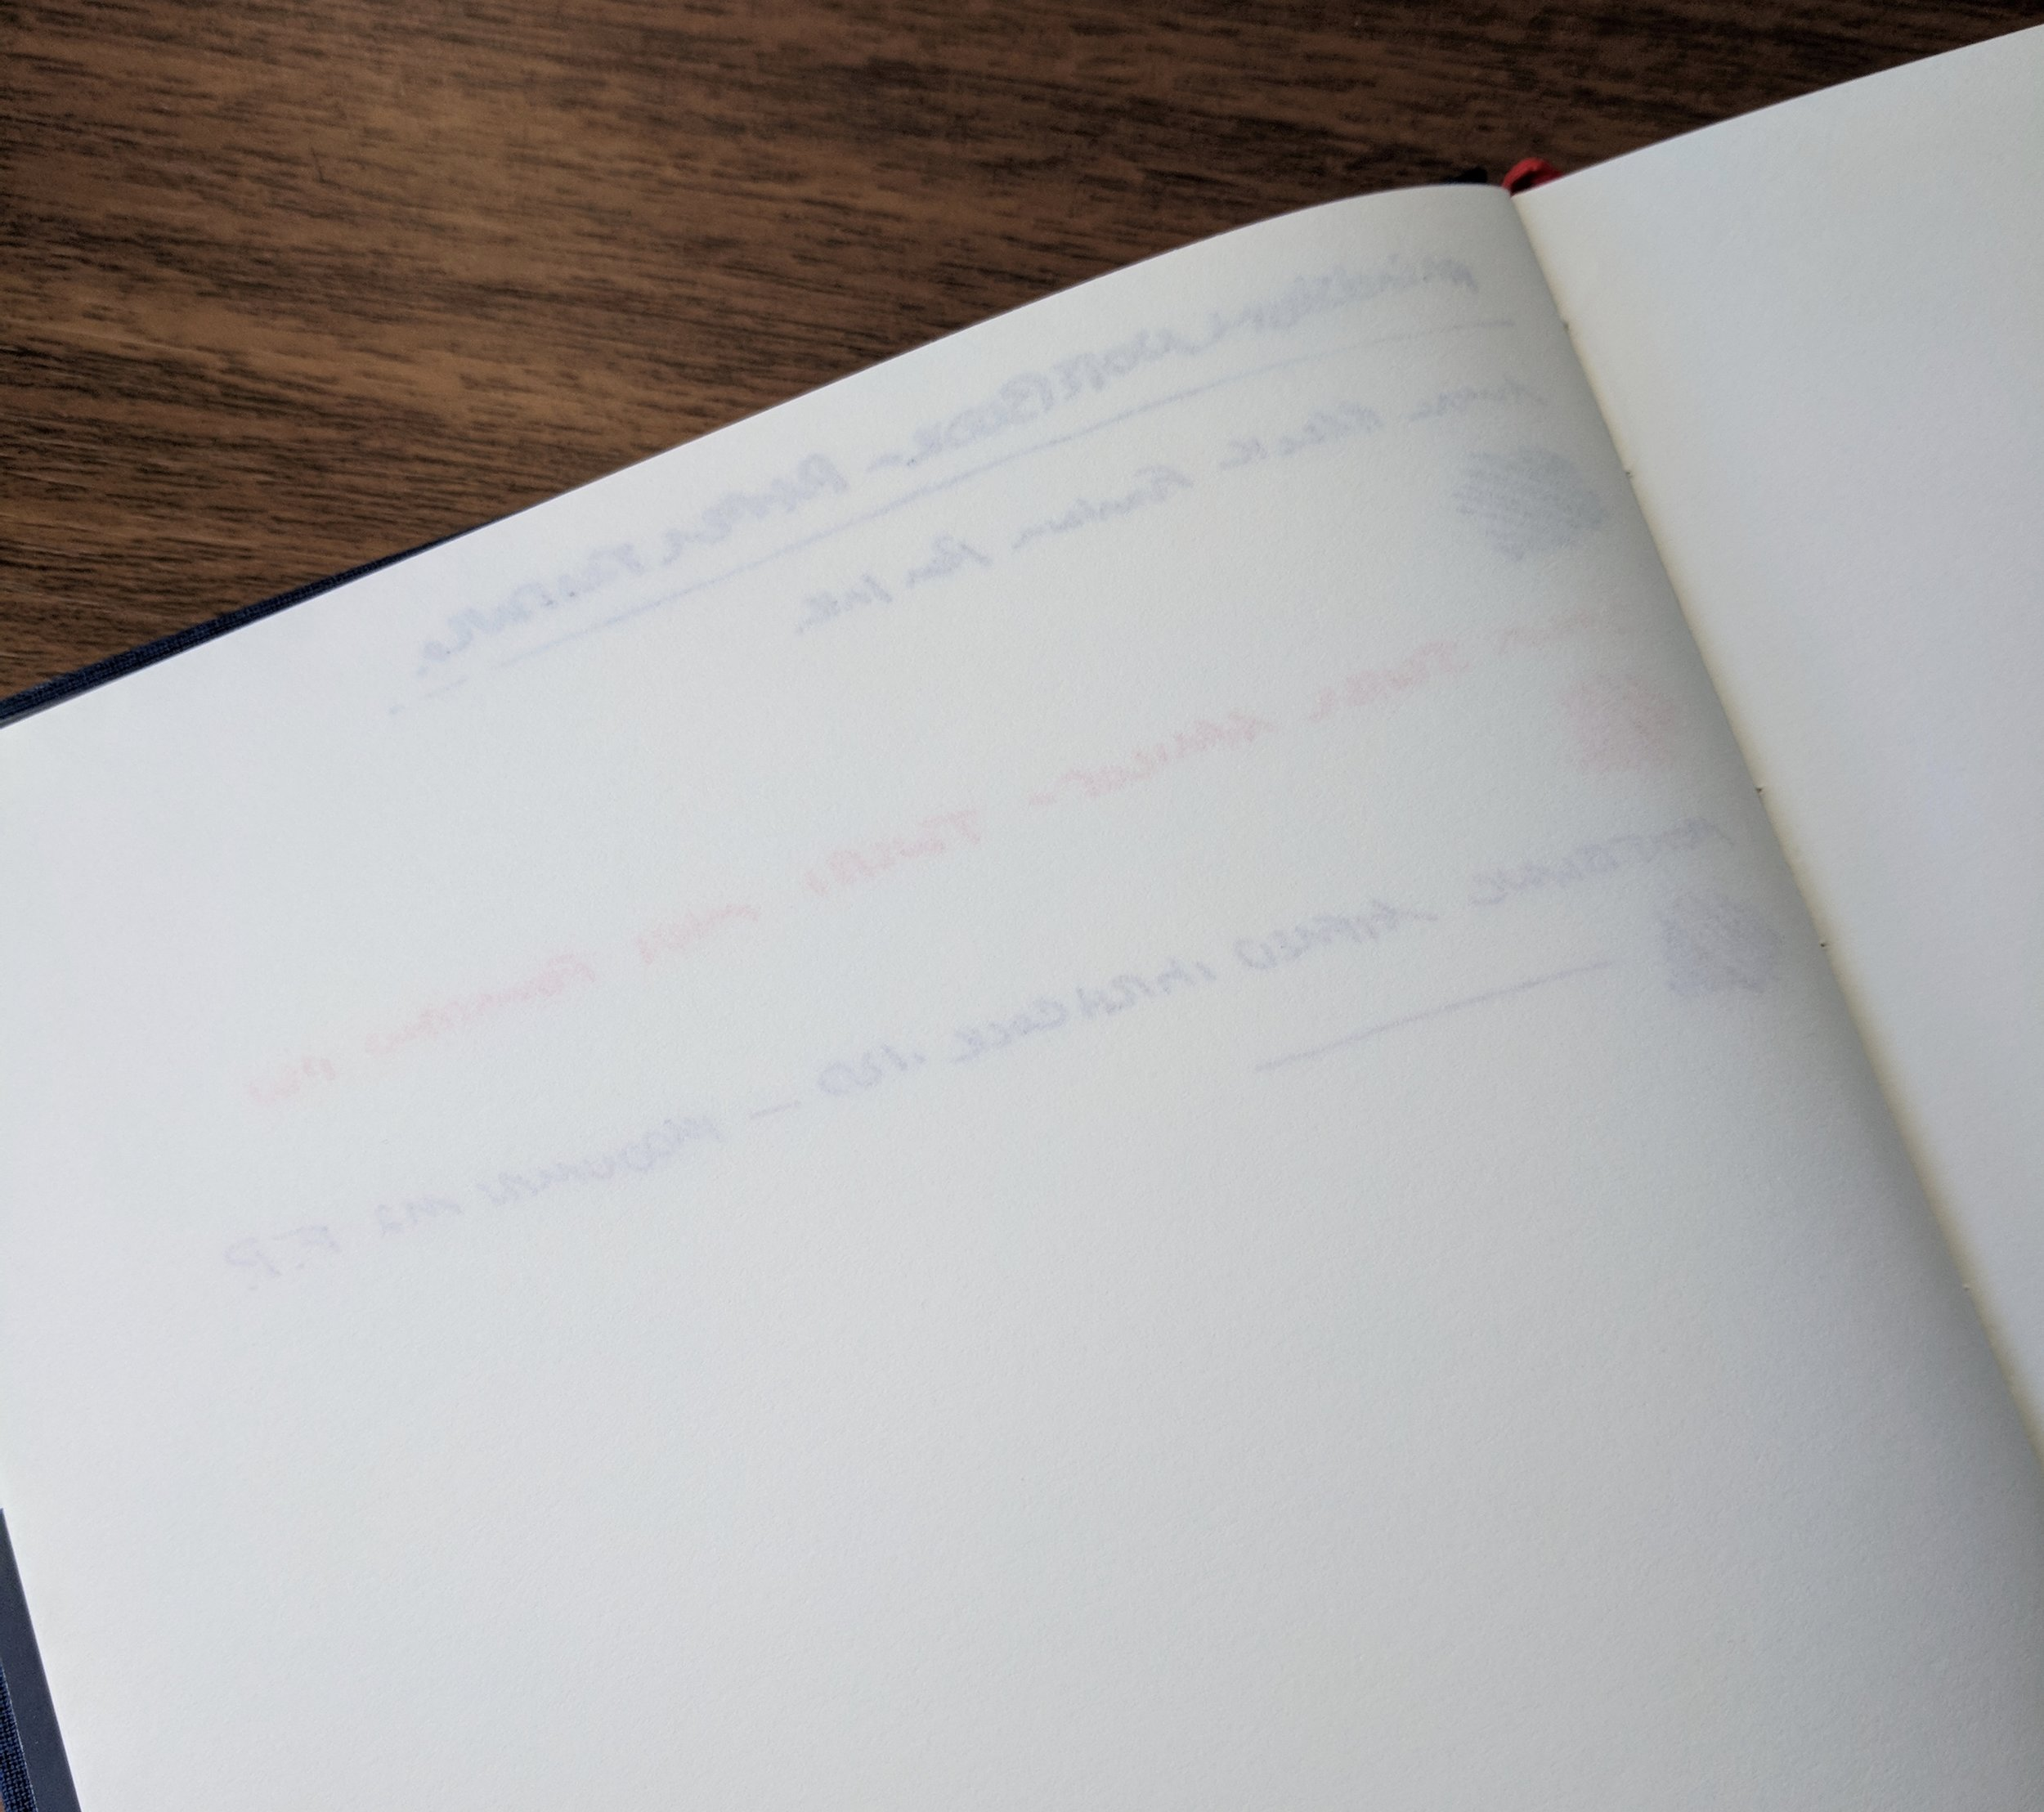 Mindstone Writing Sample - Reverse